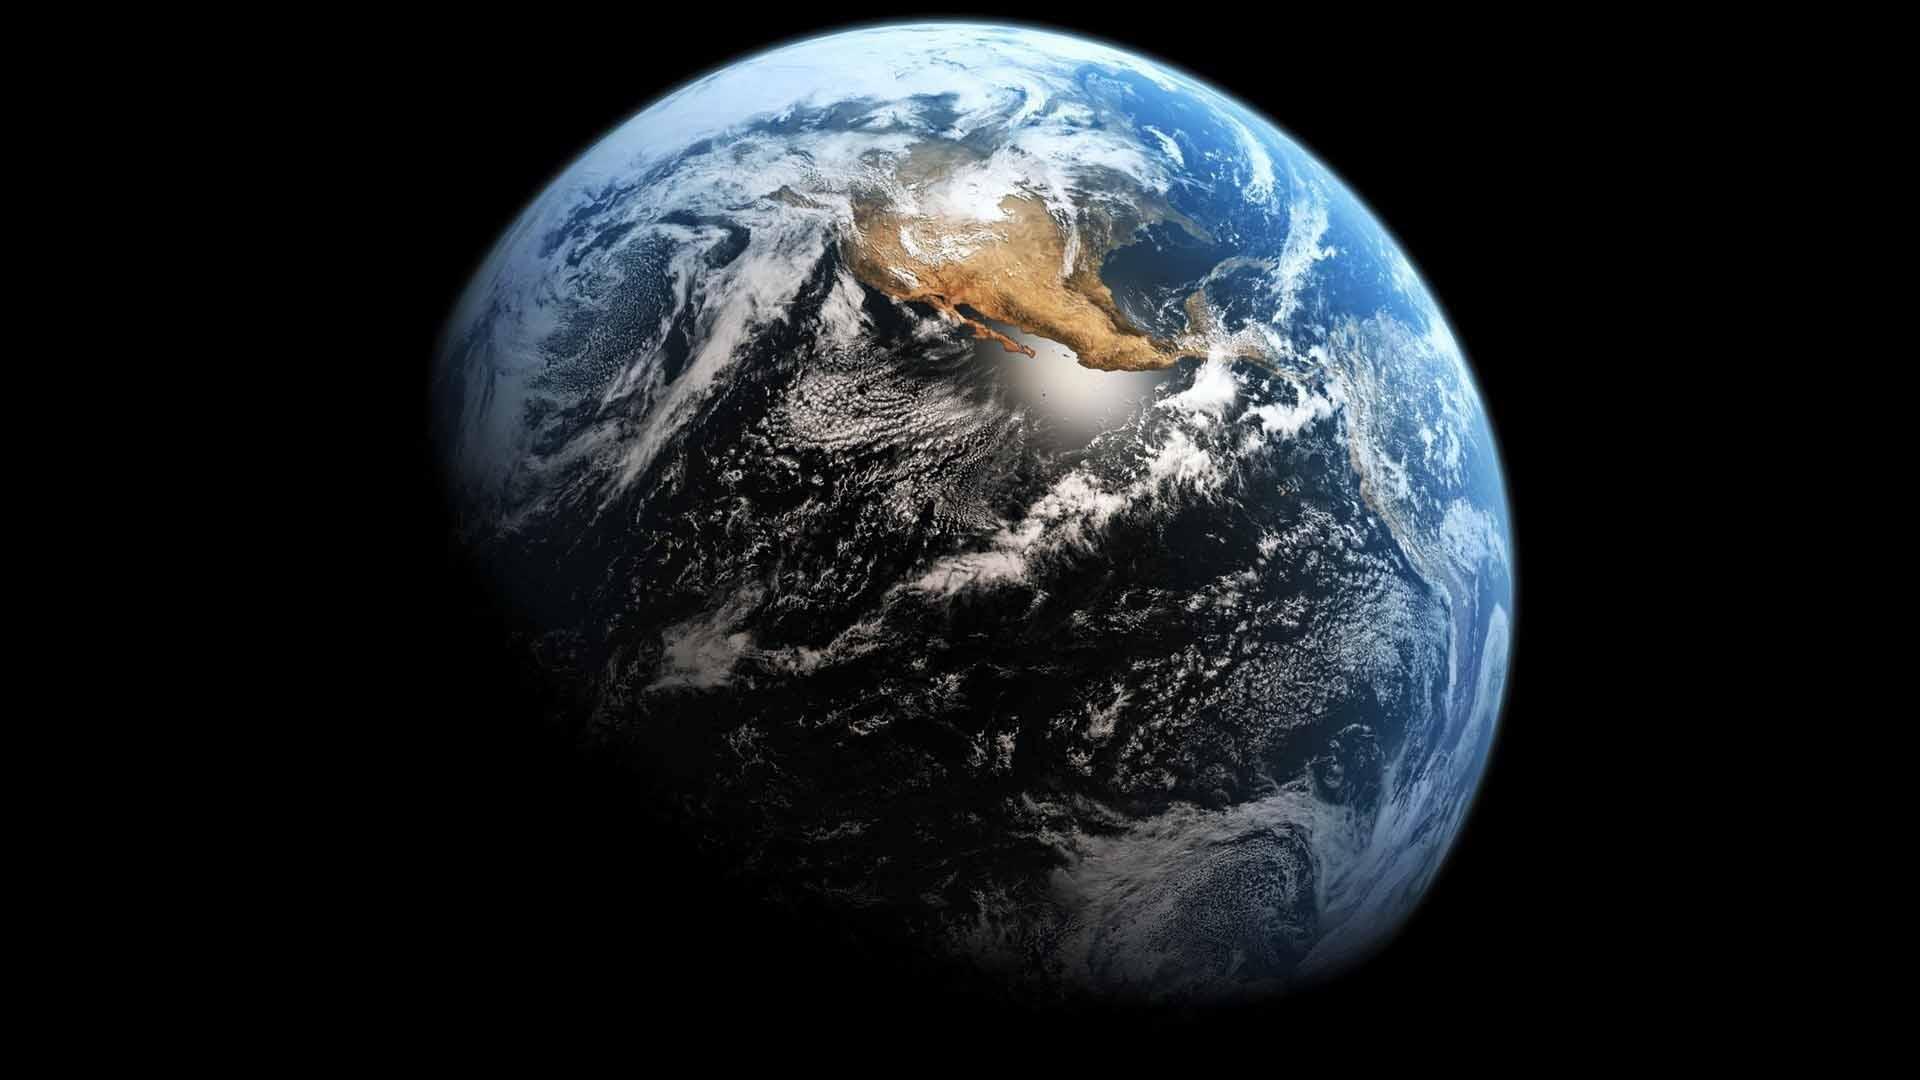 earth_wallpaper_hd_1080p_46649.jpg